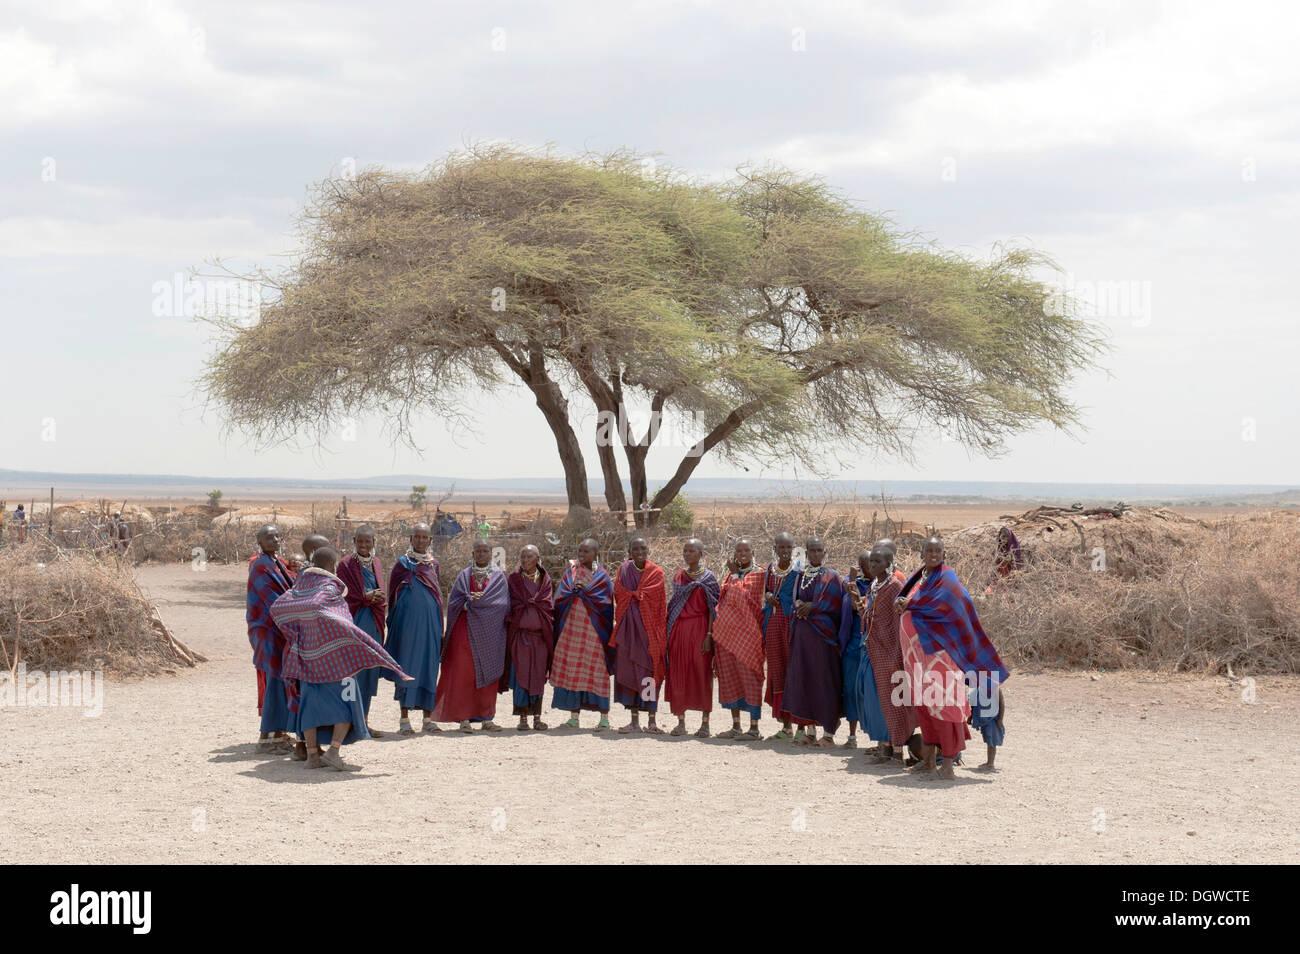 Group of women gathered under an acacia tree, Masai, ethnology, Kiloki village, Savannah, Ngorongoro Conservation Area - Stock Image